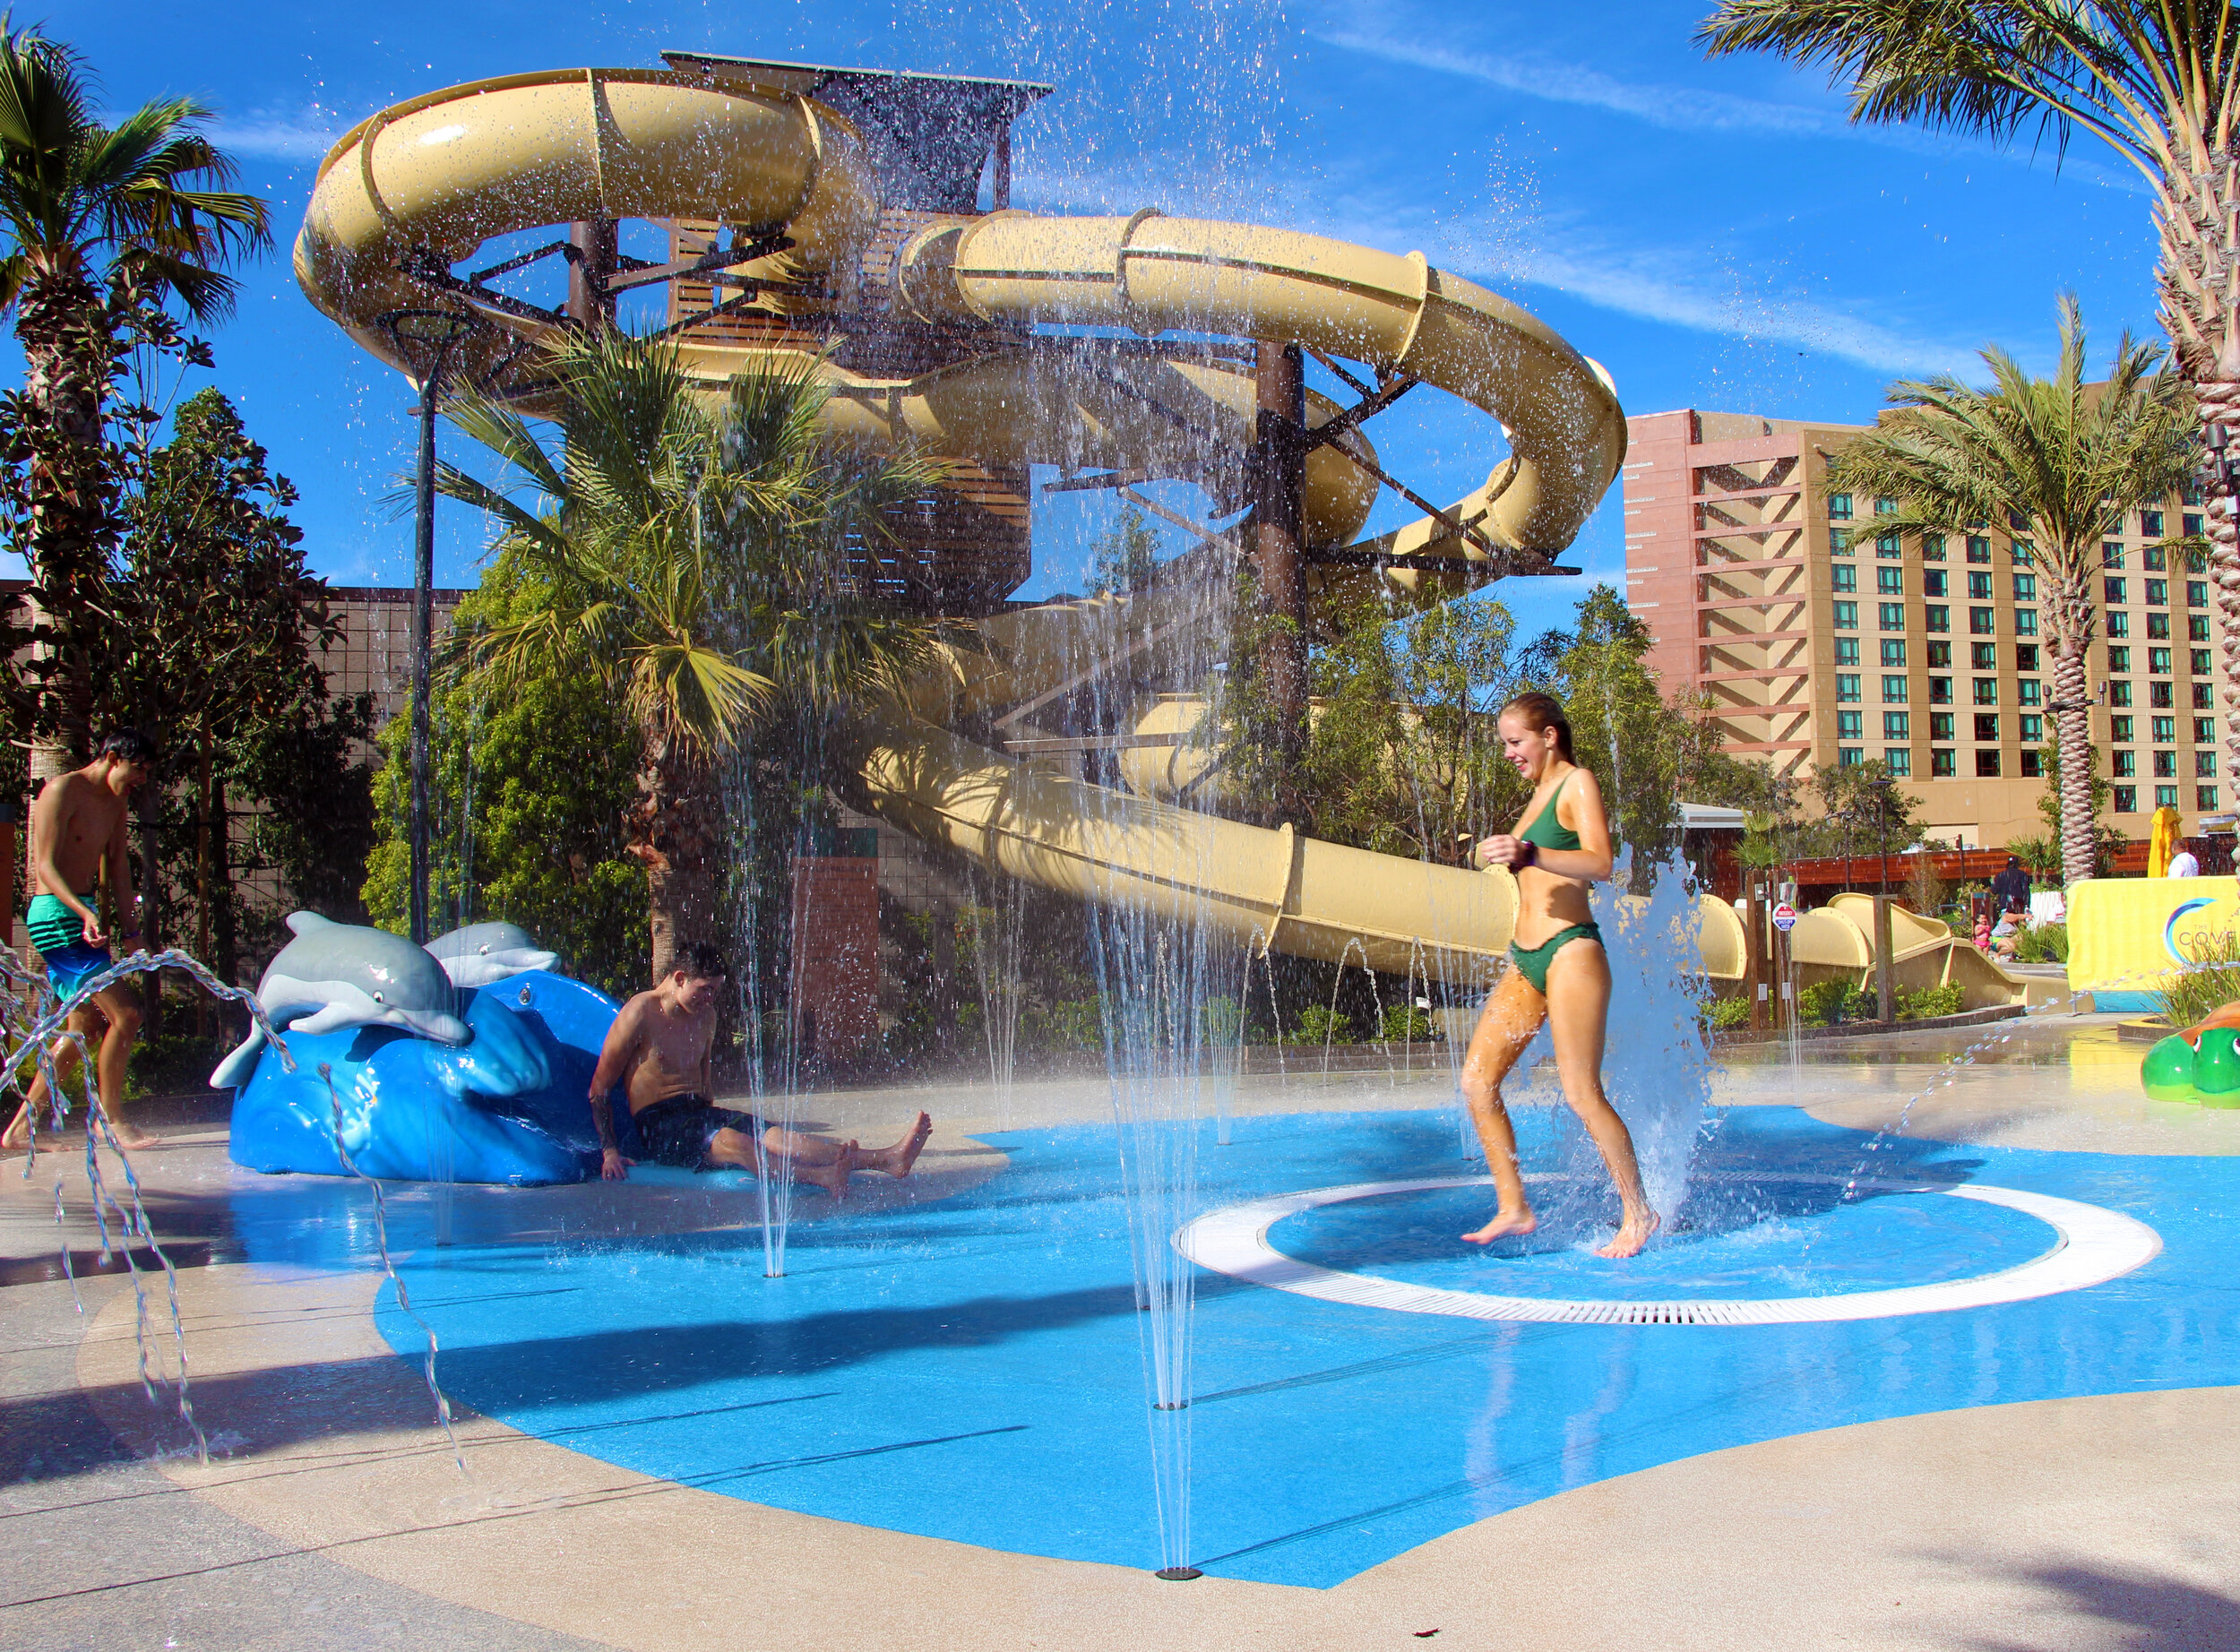 The pool complex at the Pechanga Resort Casino is a destination in itself! © Tony DiBona Photography